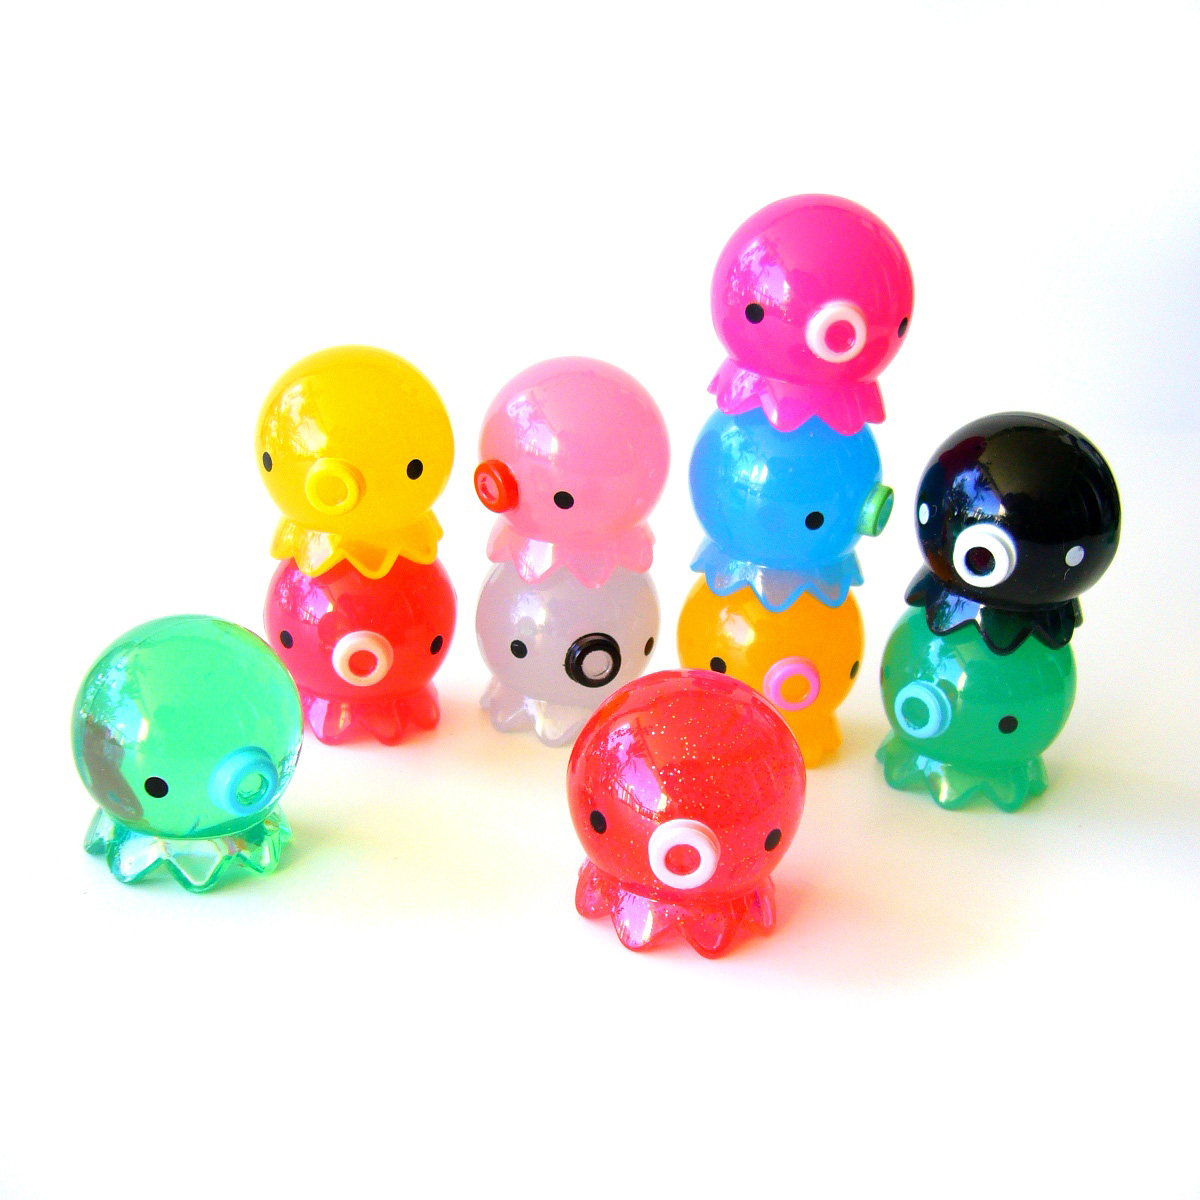 Cute Japanese Toys : That hapa chick kawaii monday takochu